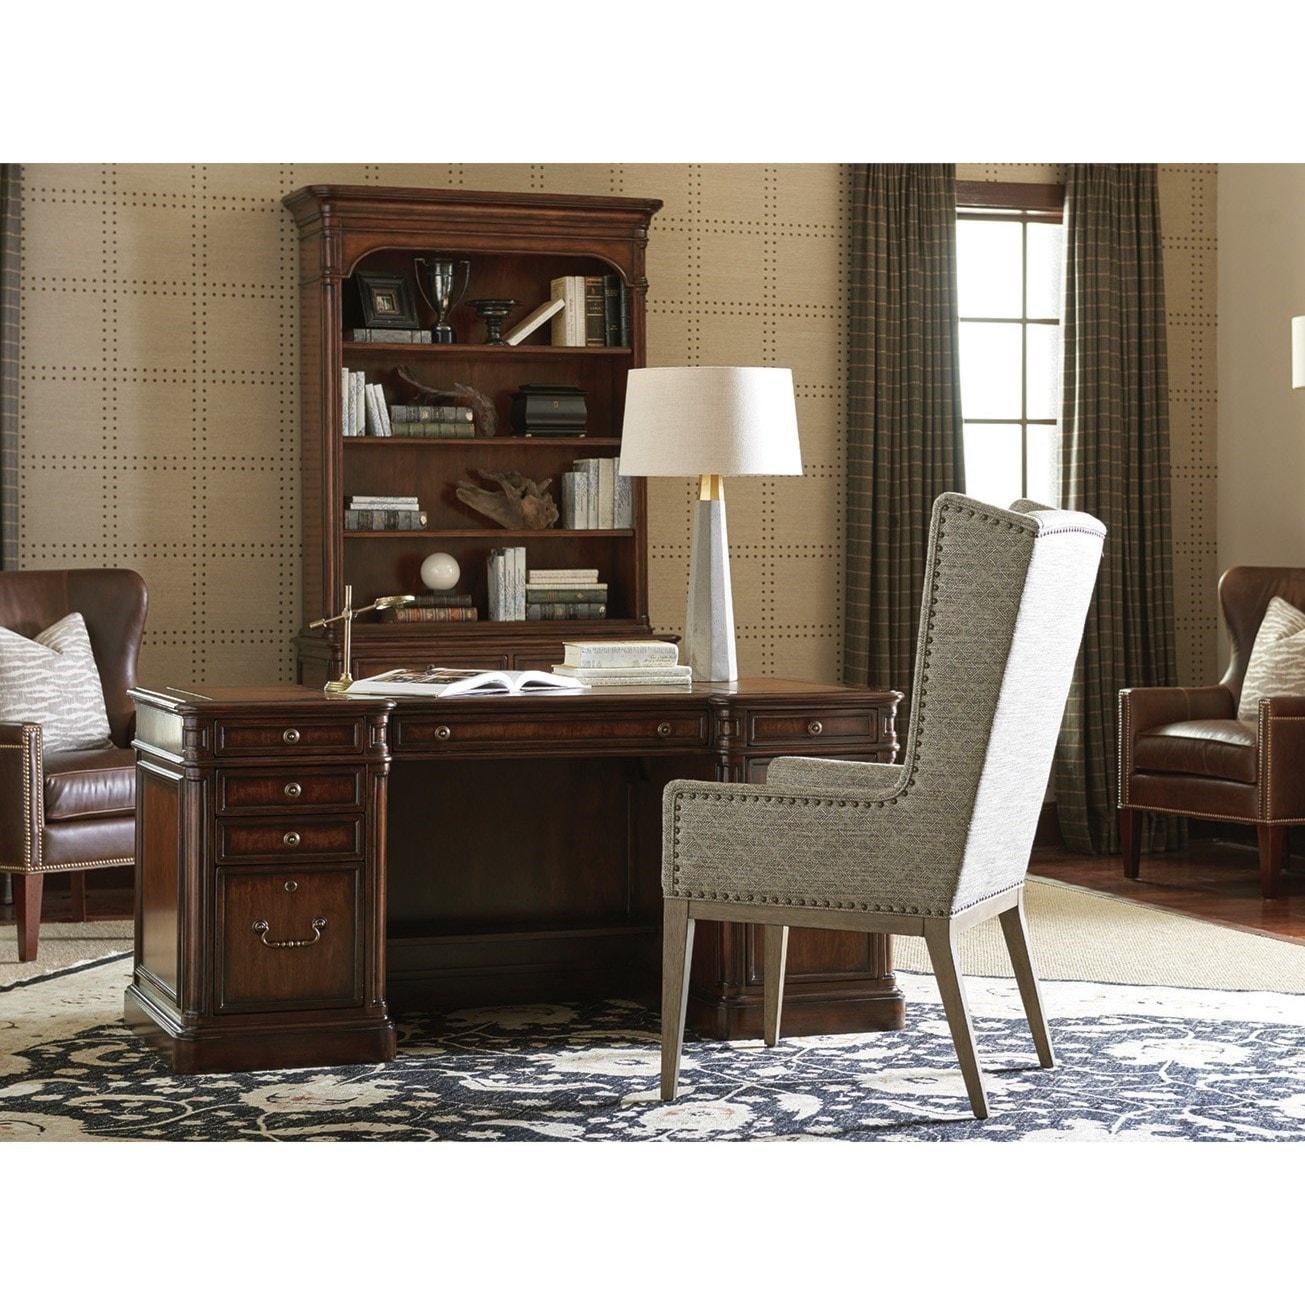 sligh furniture office room. Sligh Richmond HillMorgan Executive Desk Furniture Office Room